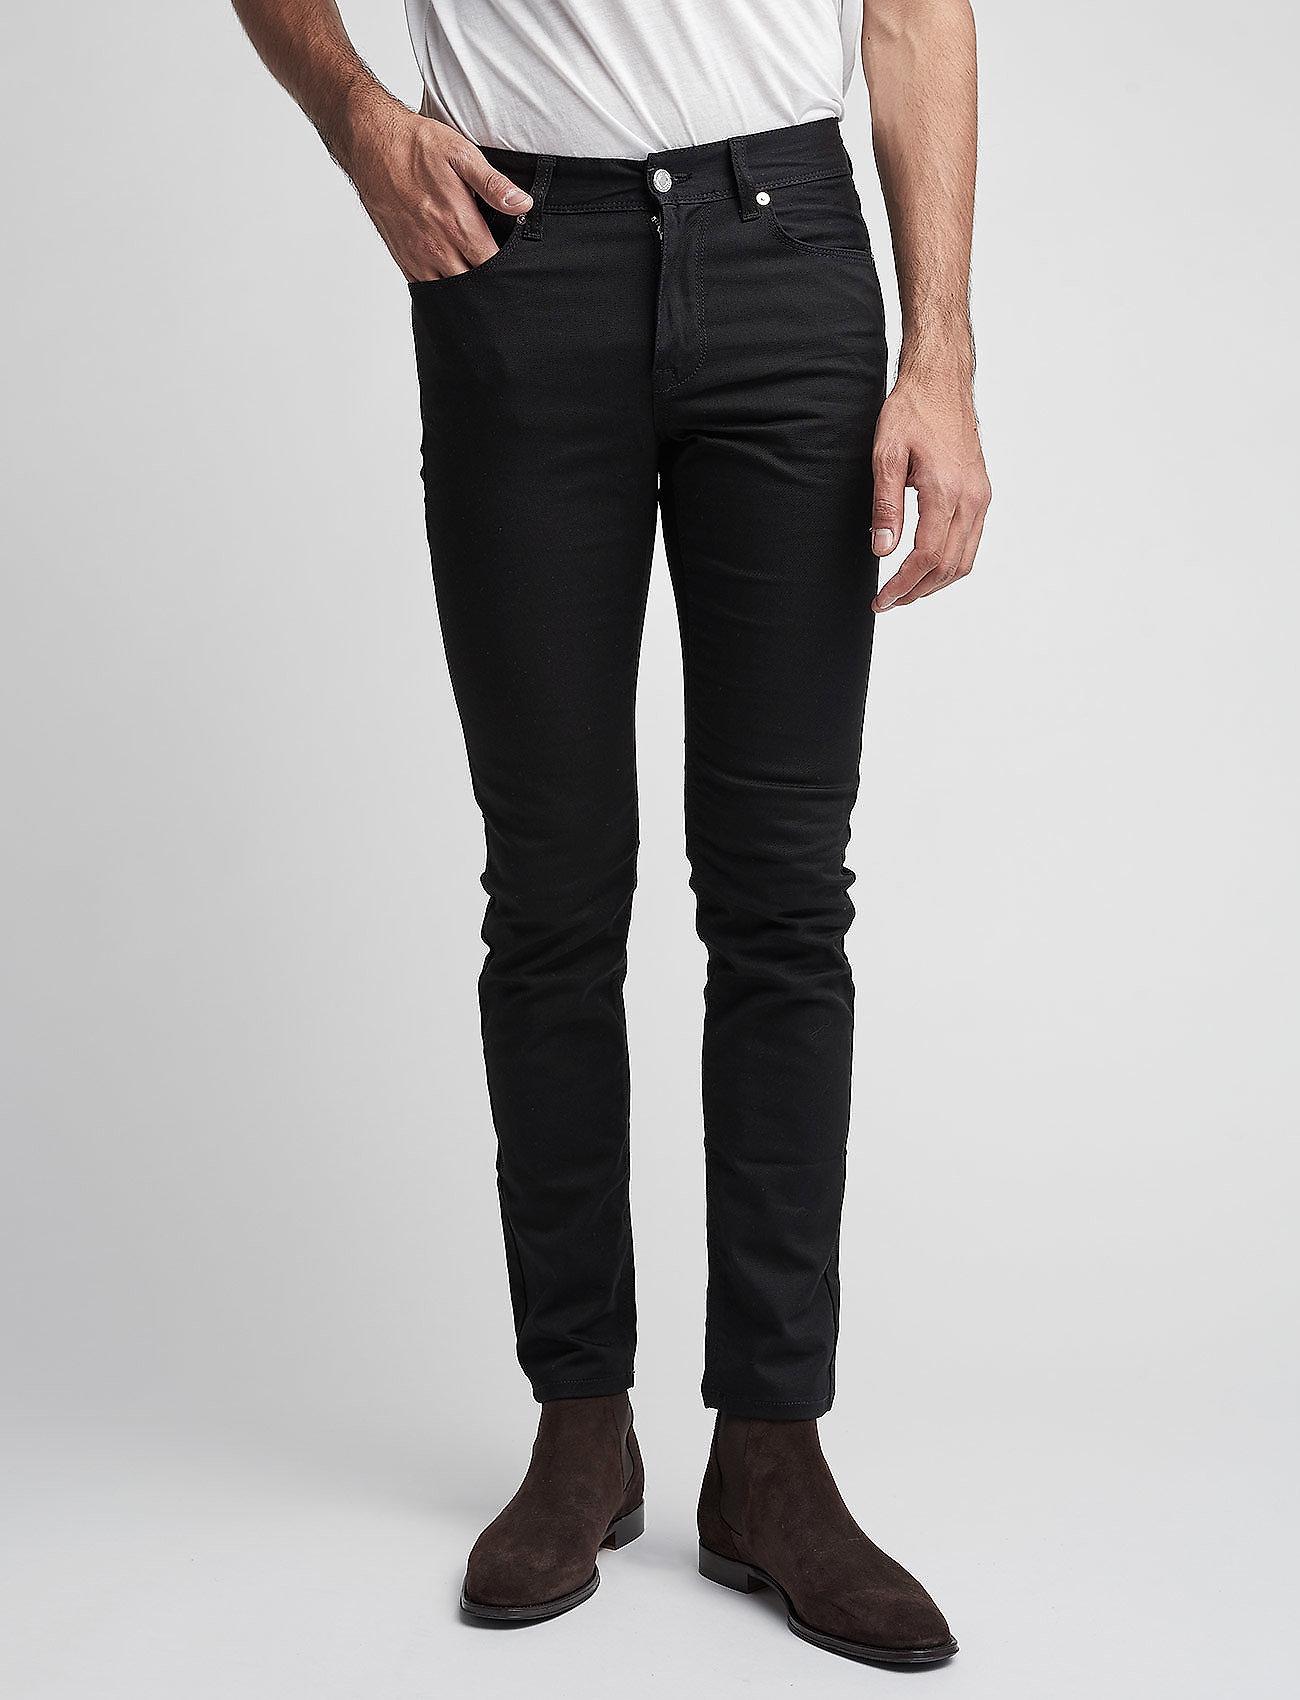 J. Lindeberg - Damien Black Stretch Denim - skinny jeans - black - 0